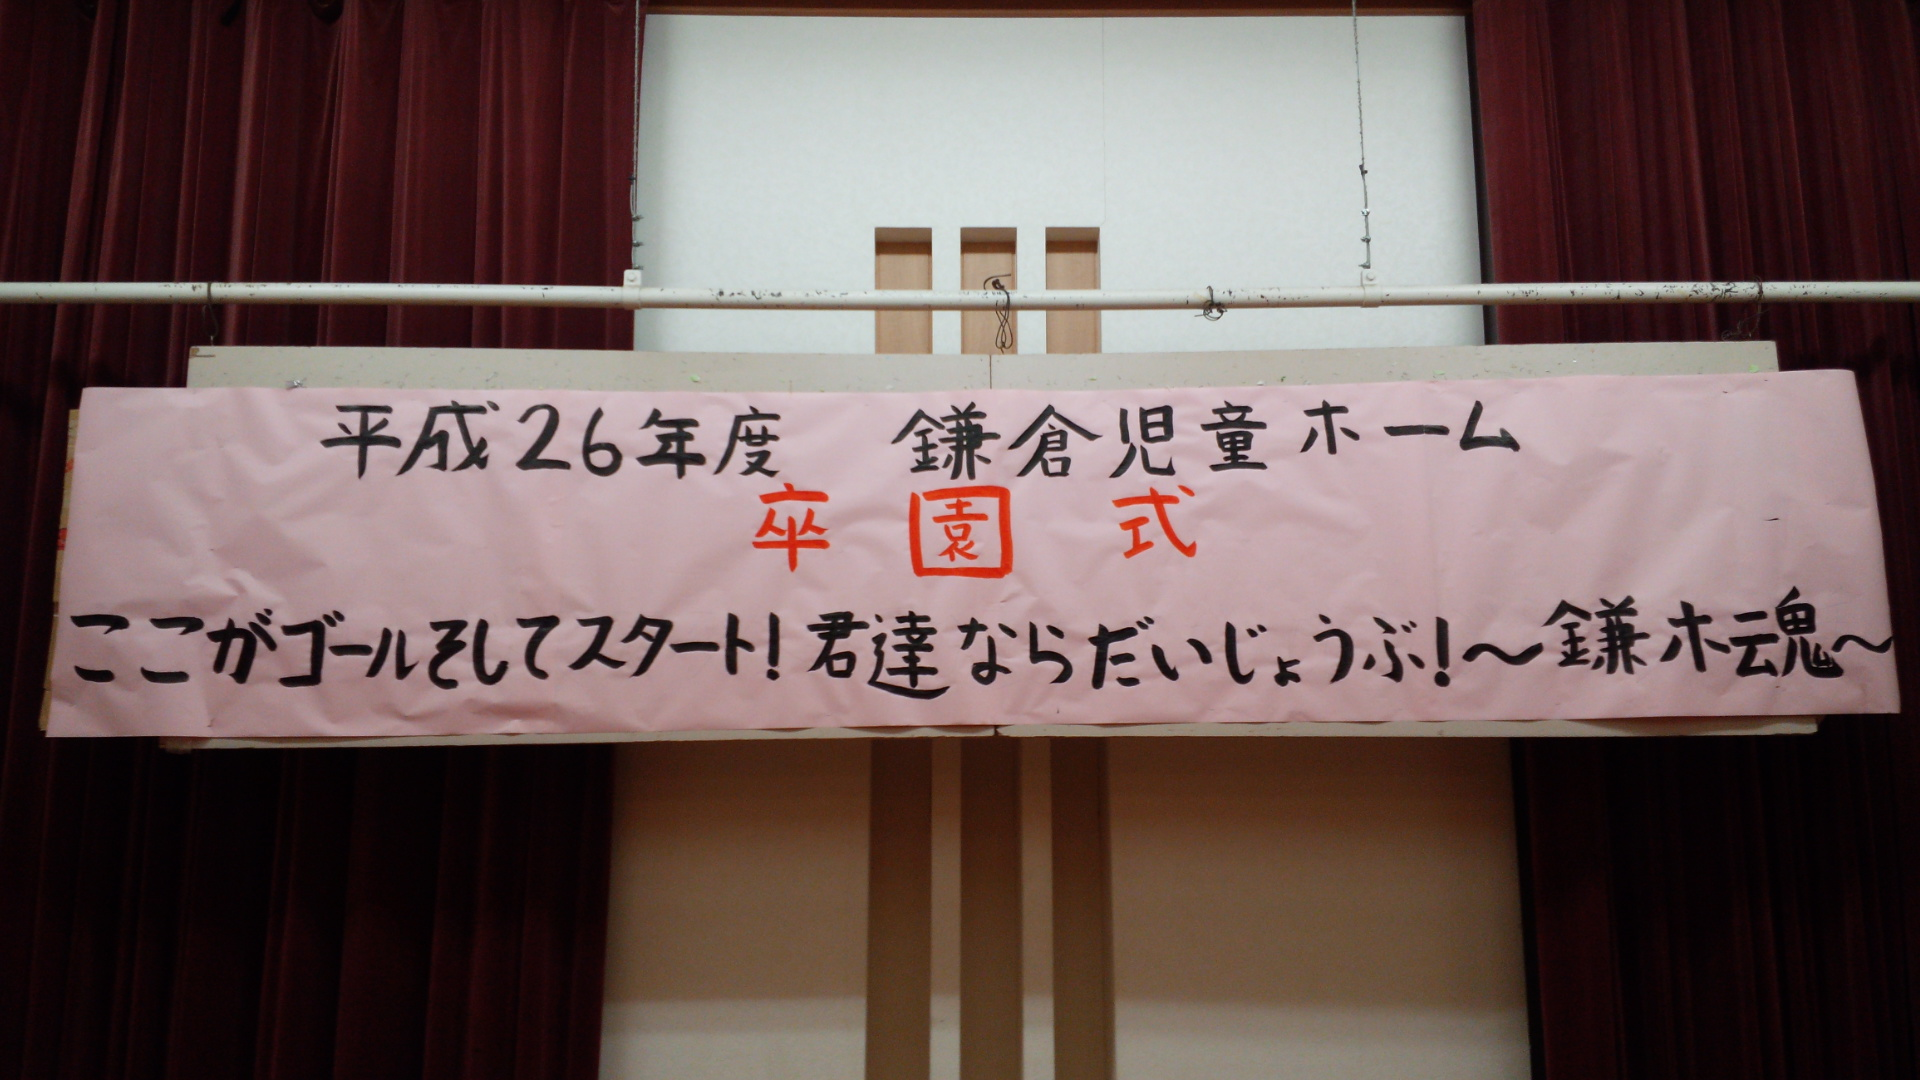 鎌倉児童ホーム卒園式_d0073005_23482197.jpg